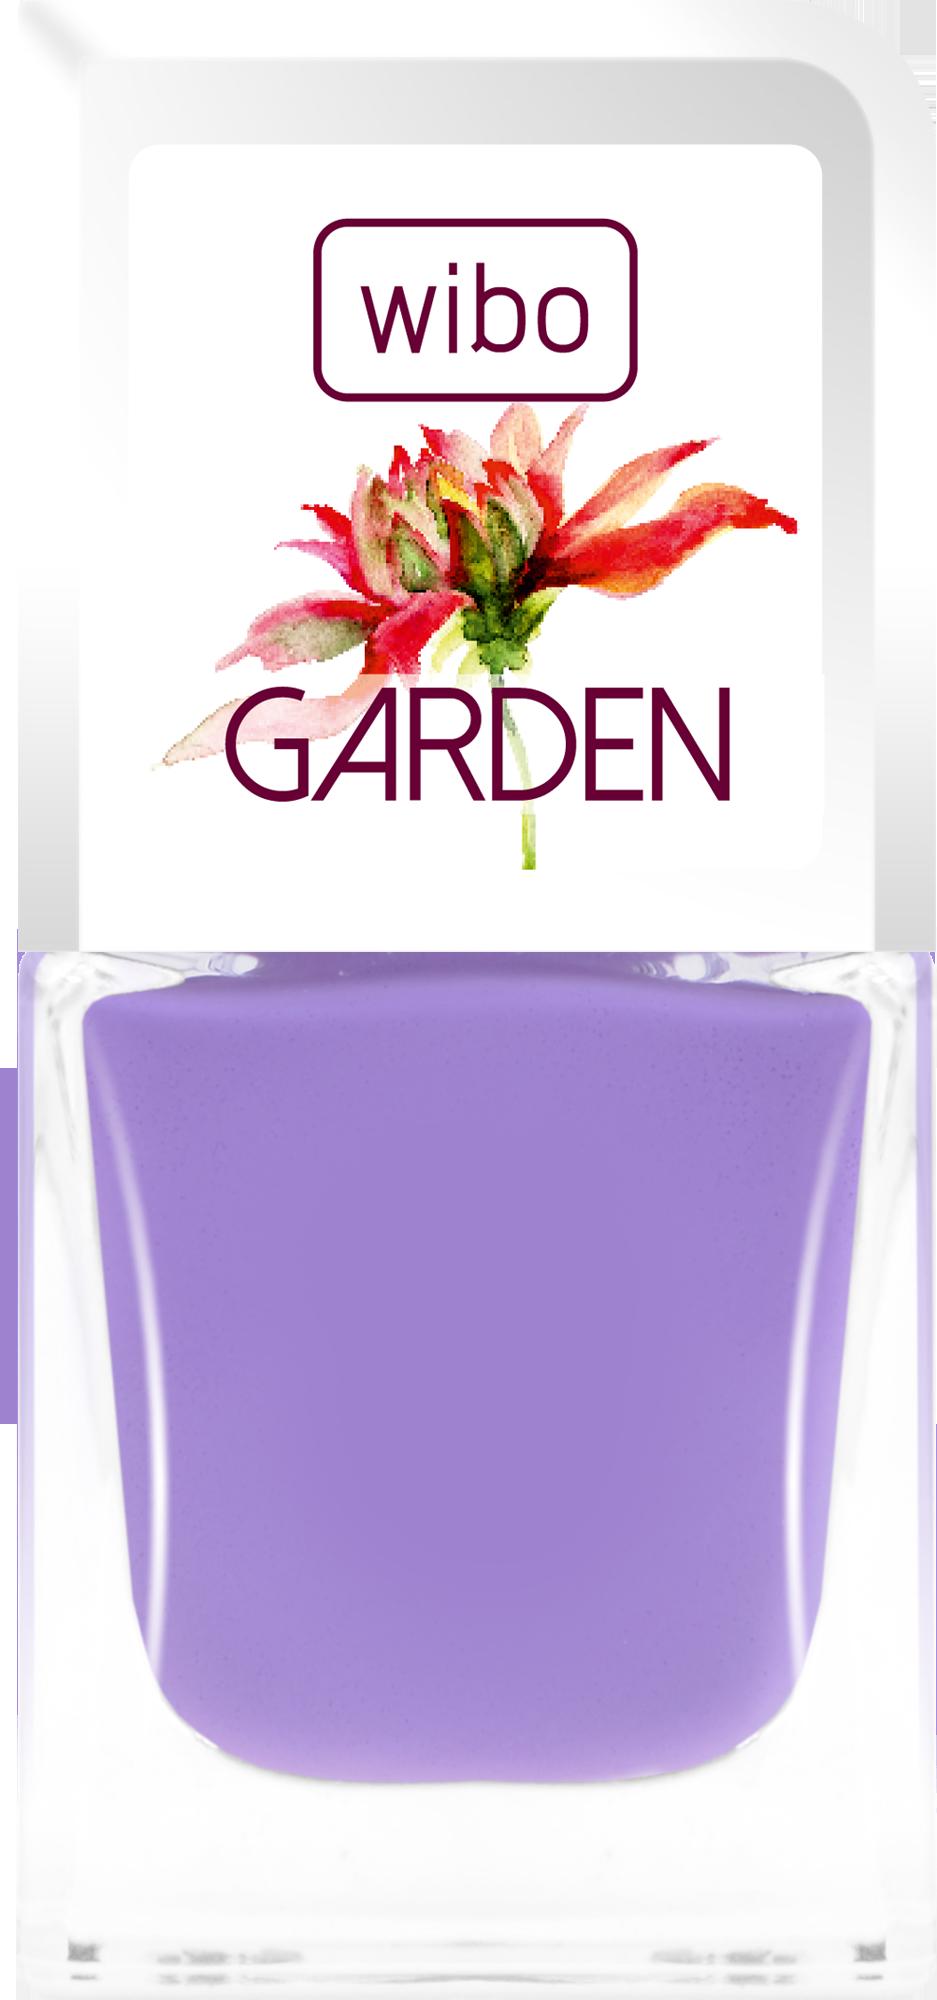 Lakier GARDEN nr 1 #nails #manicure #wibo #wibokosmetyki #kosmetyki #nailsart #color #garden #flower #new